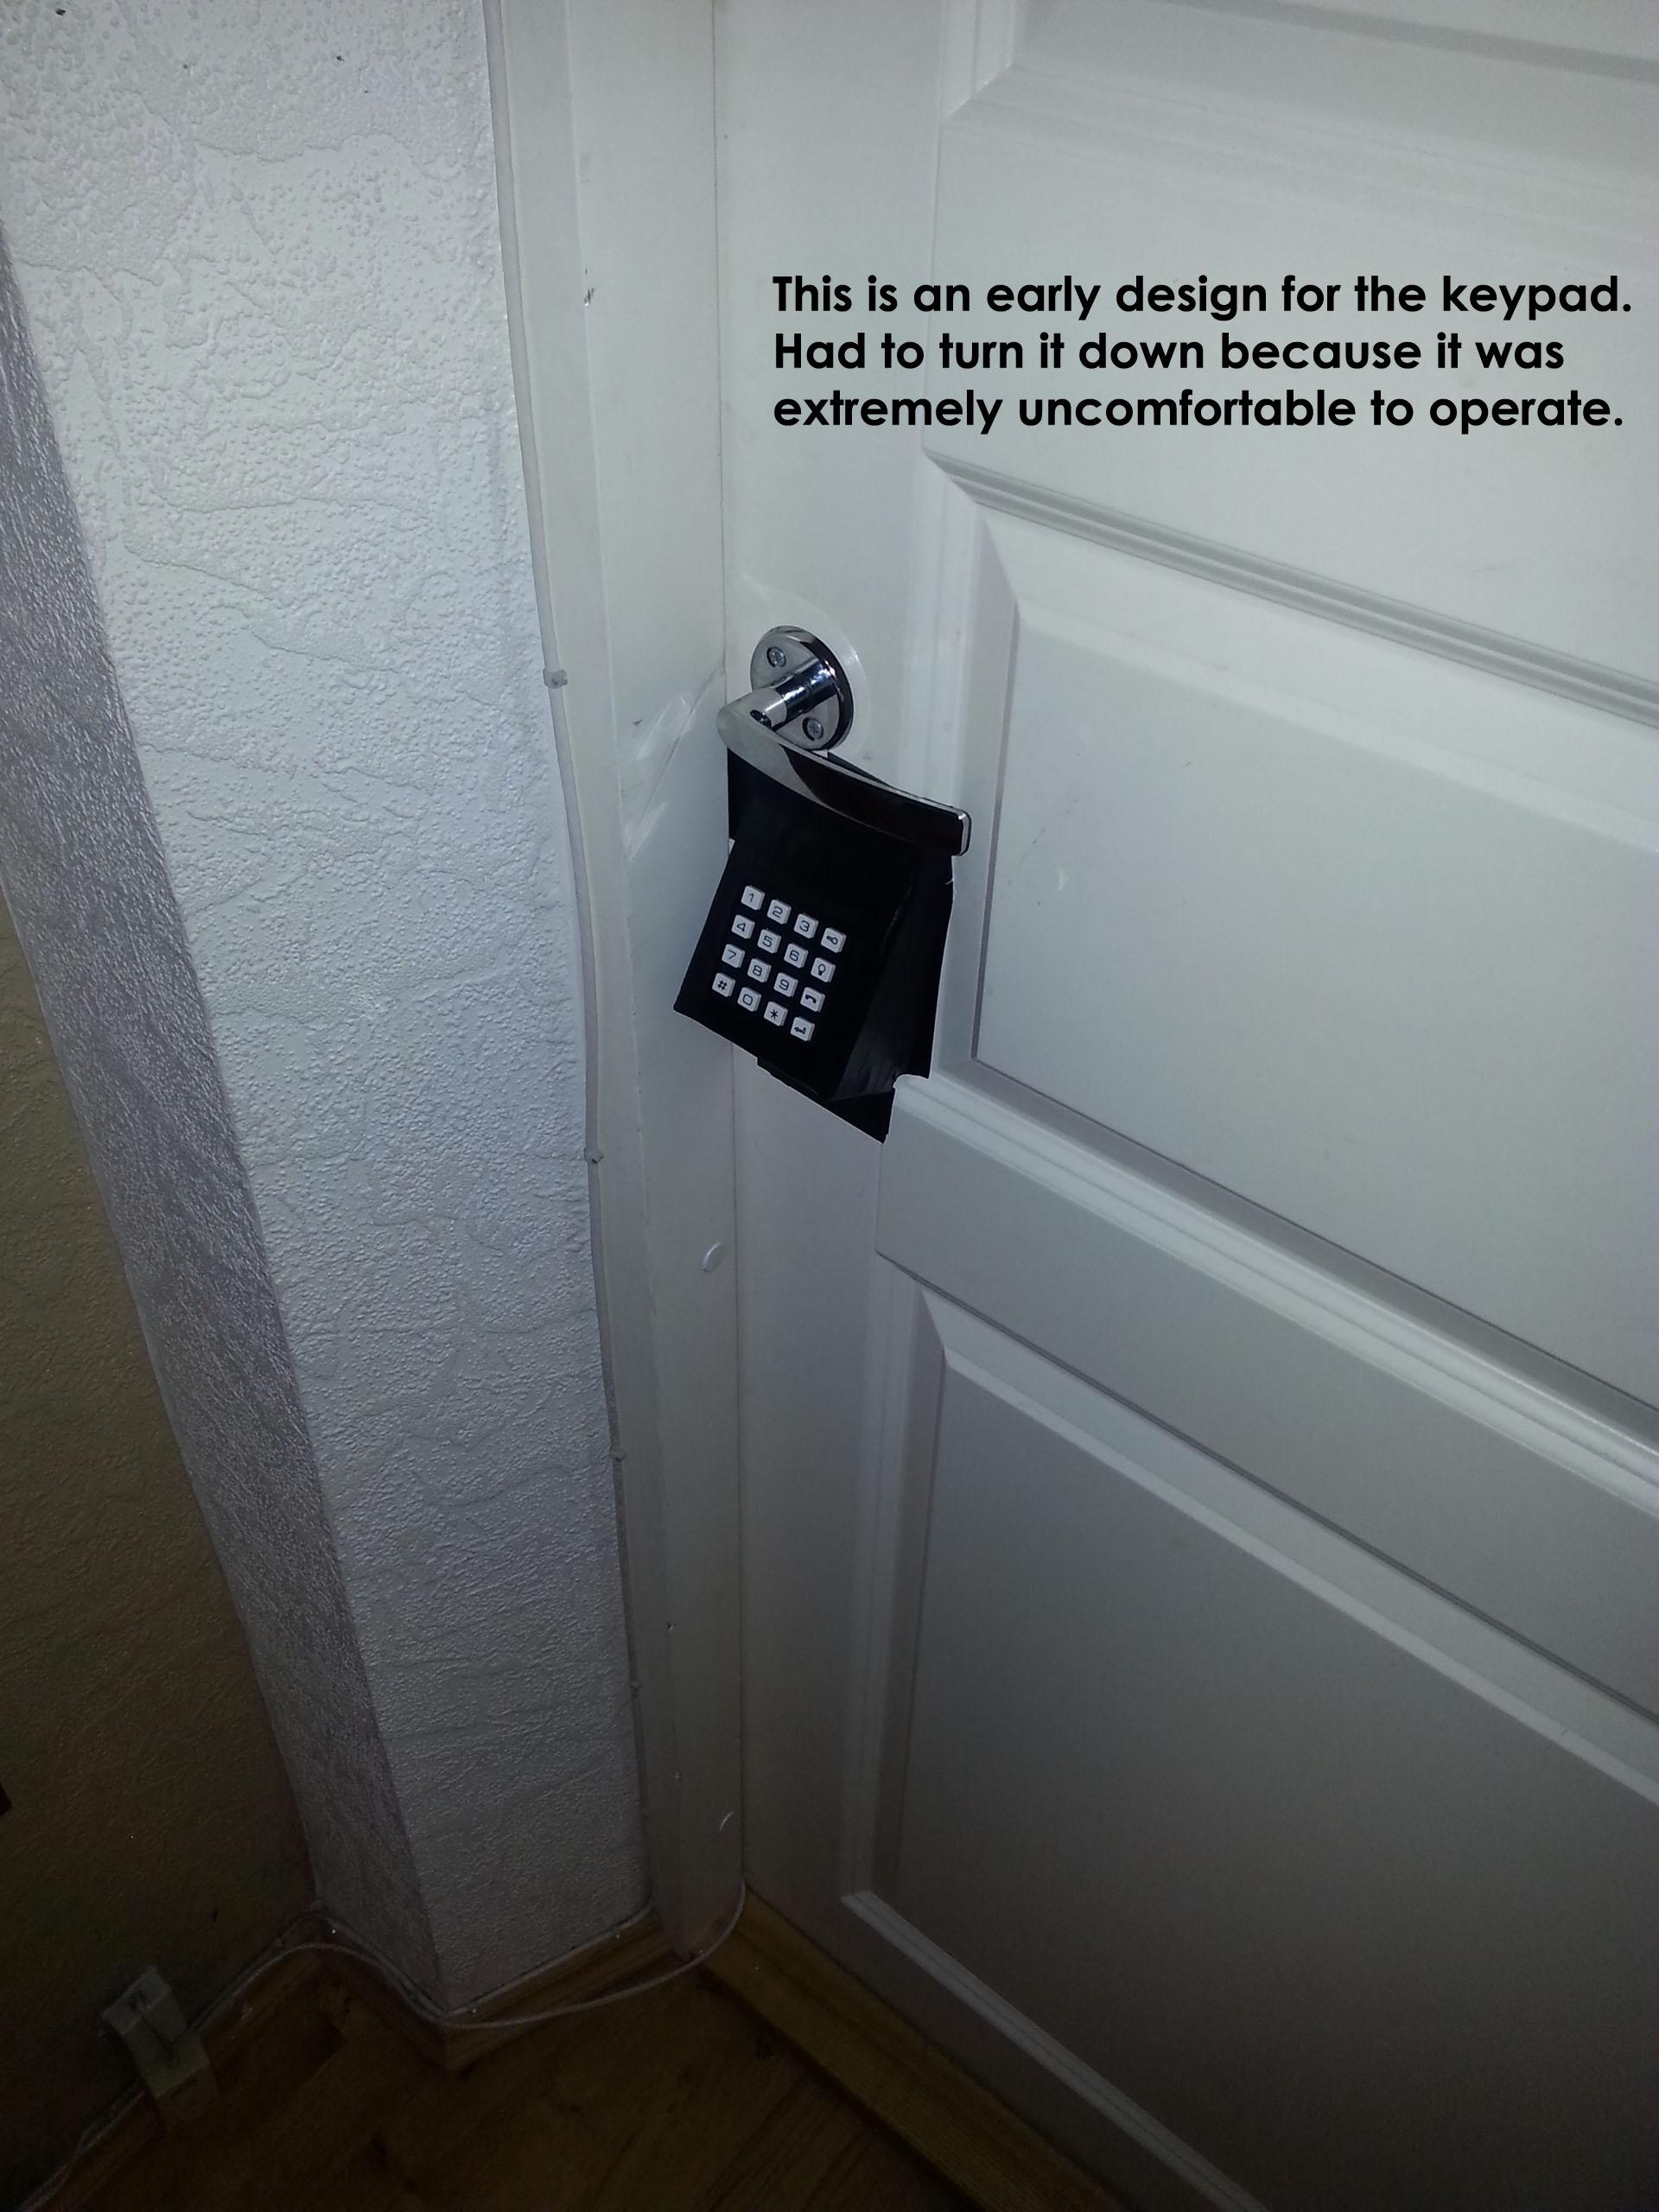 Keypad operated door lock